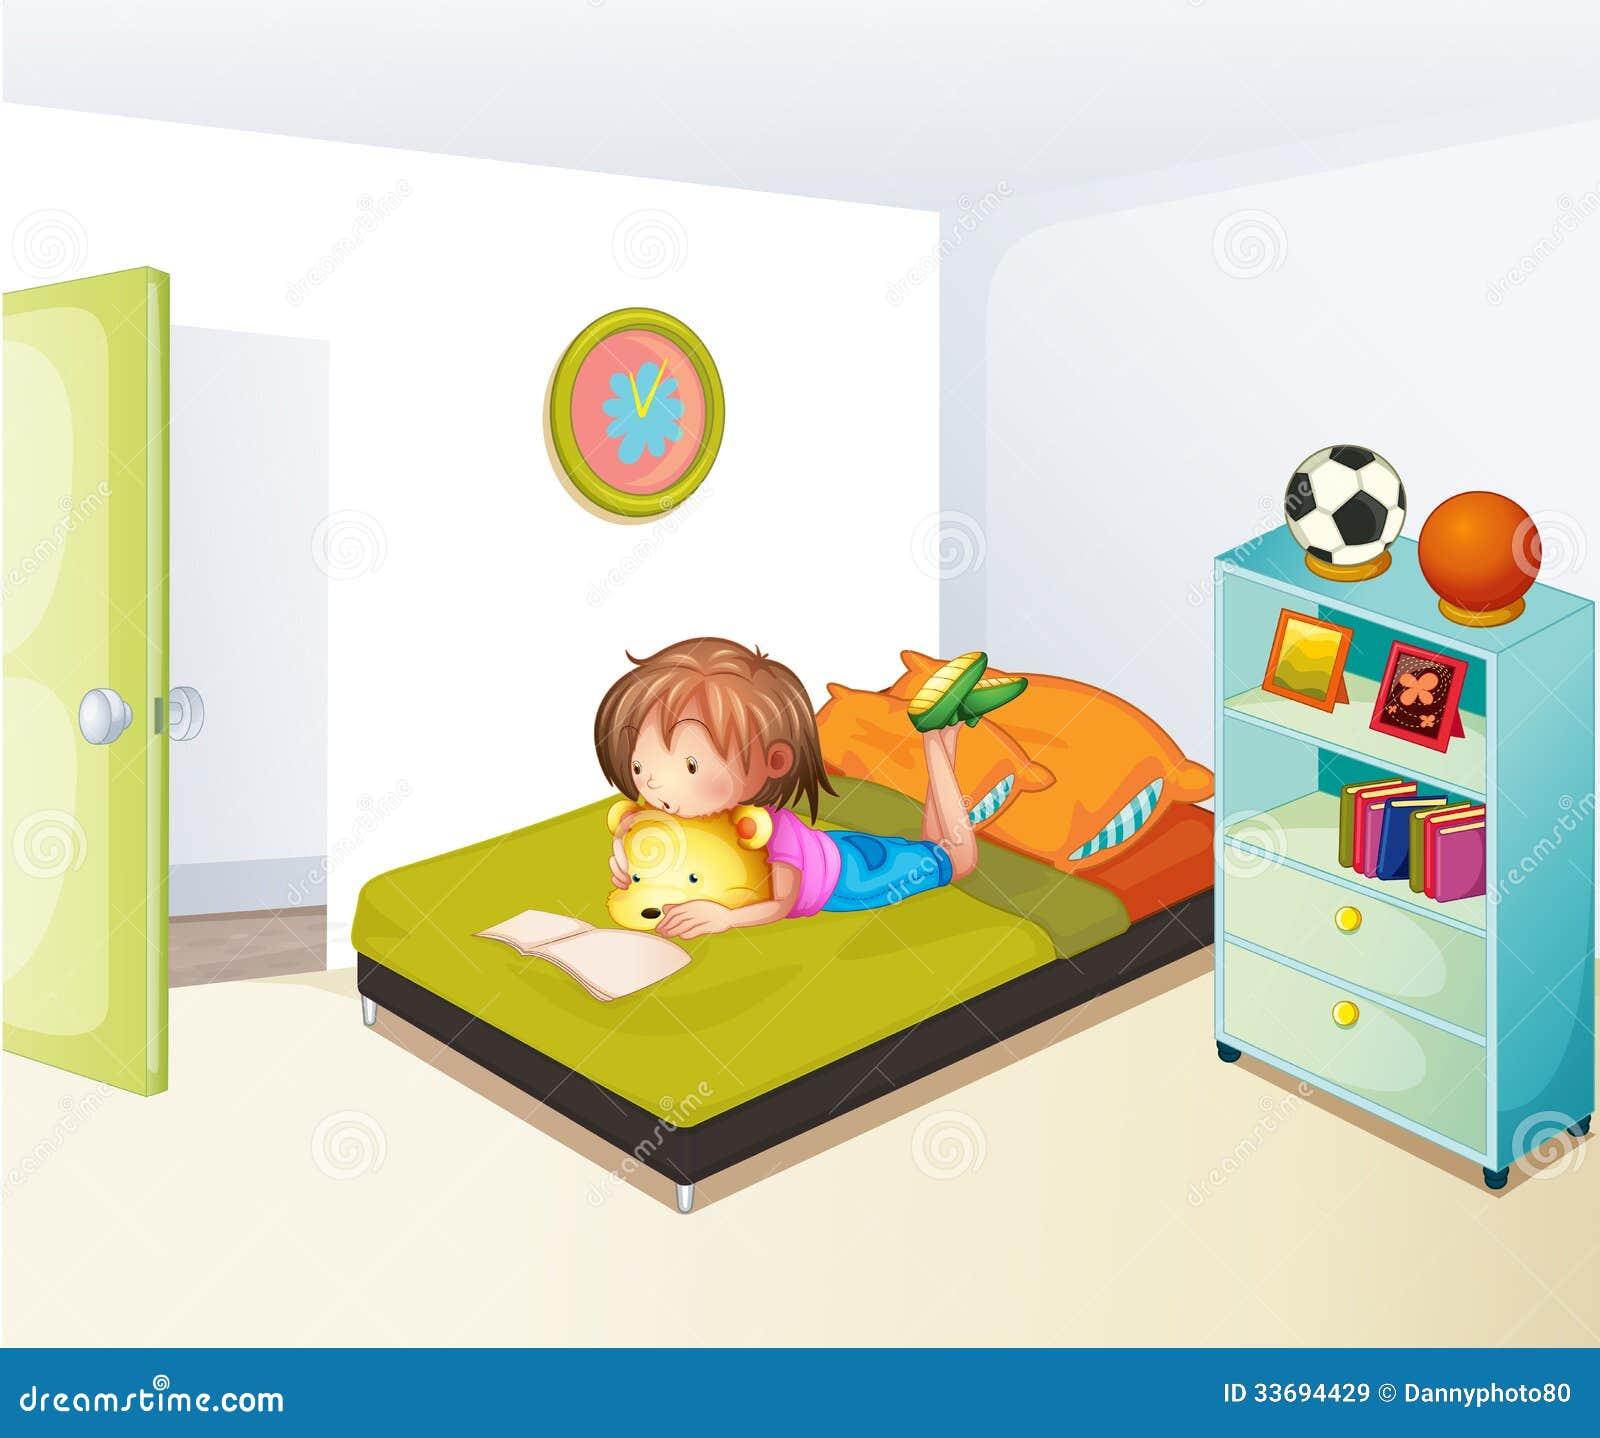 Kids Bedroom Artwork Bedroom Art Gallery Lilac And Blue Bedroom Nice Bedroom Colour: A Girl Studying In Her Clean Bedroom Stock Vector